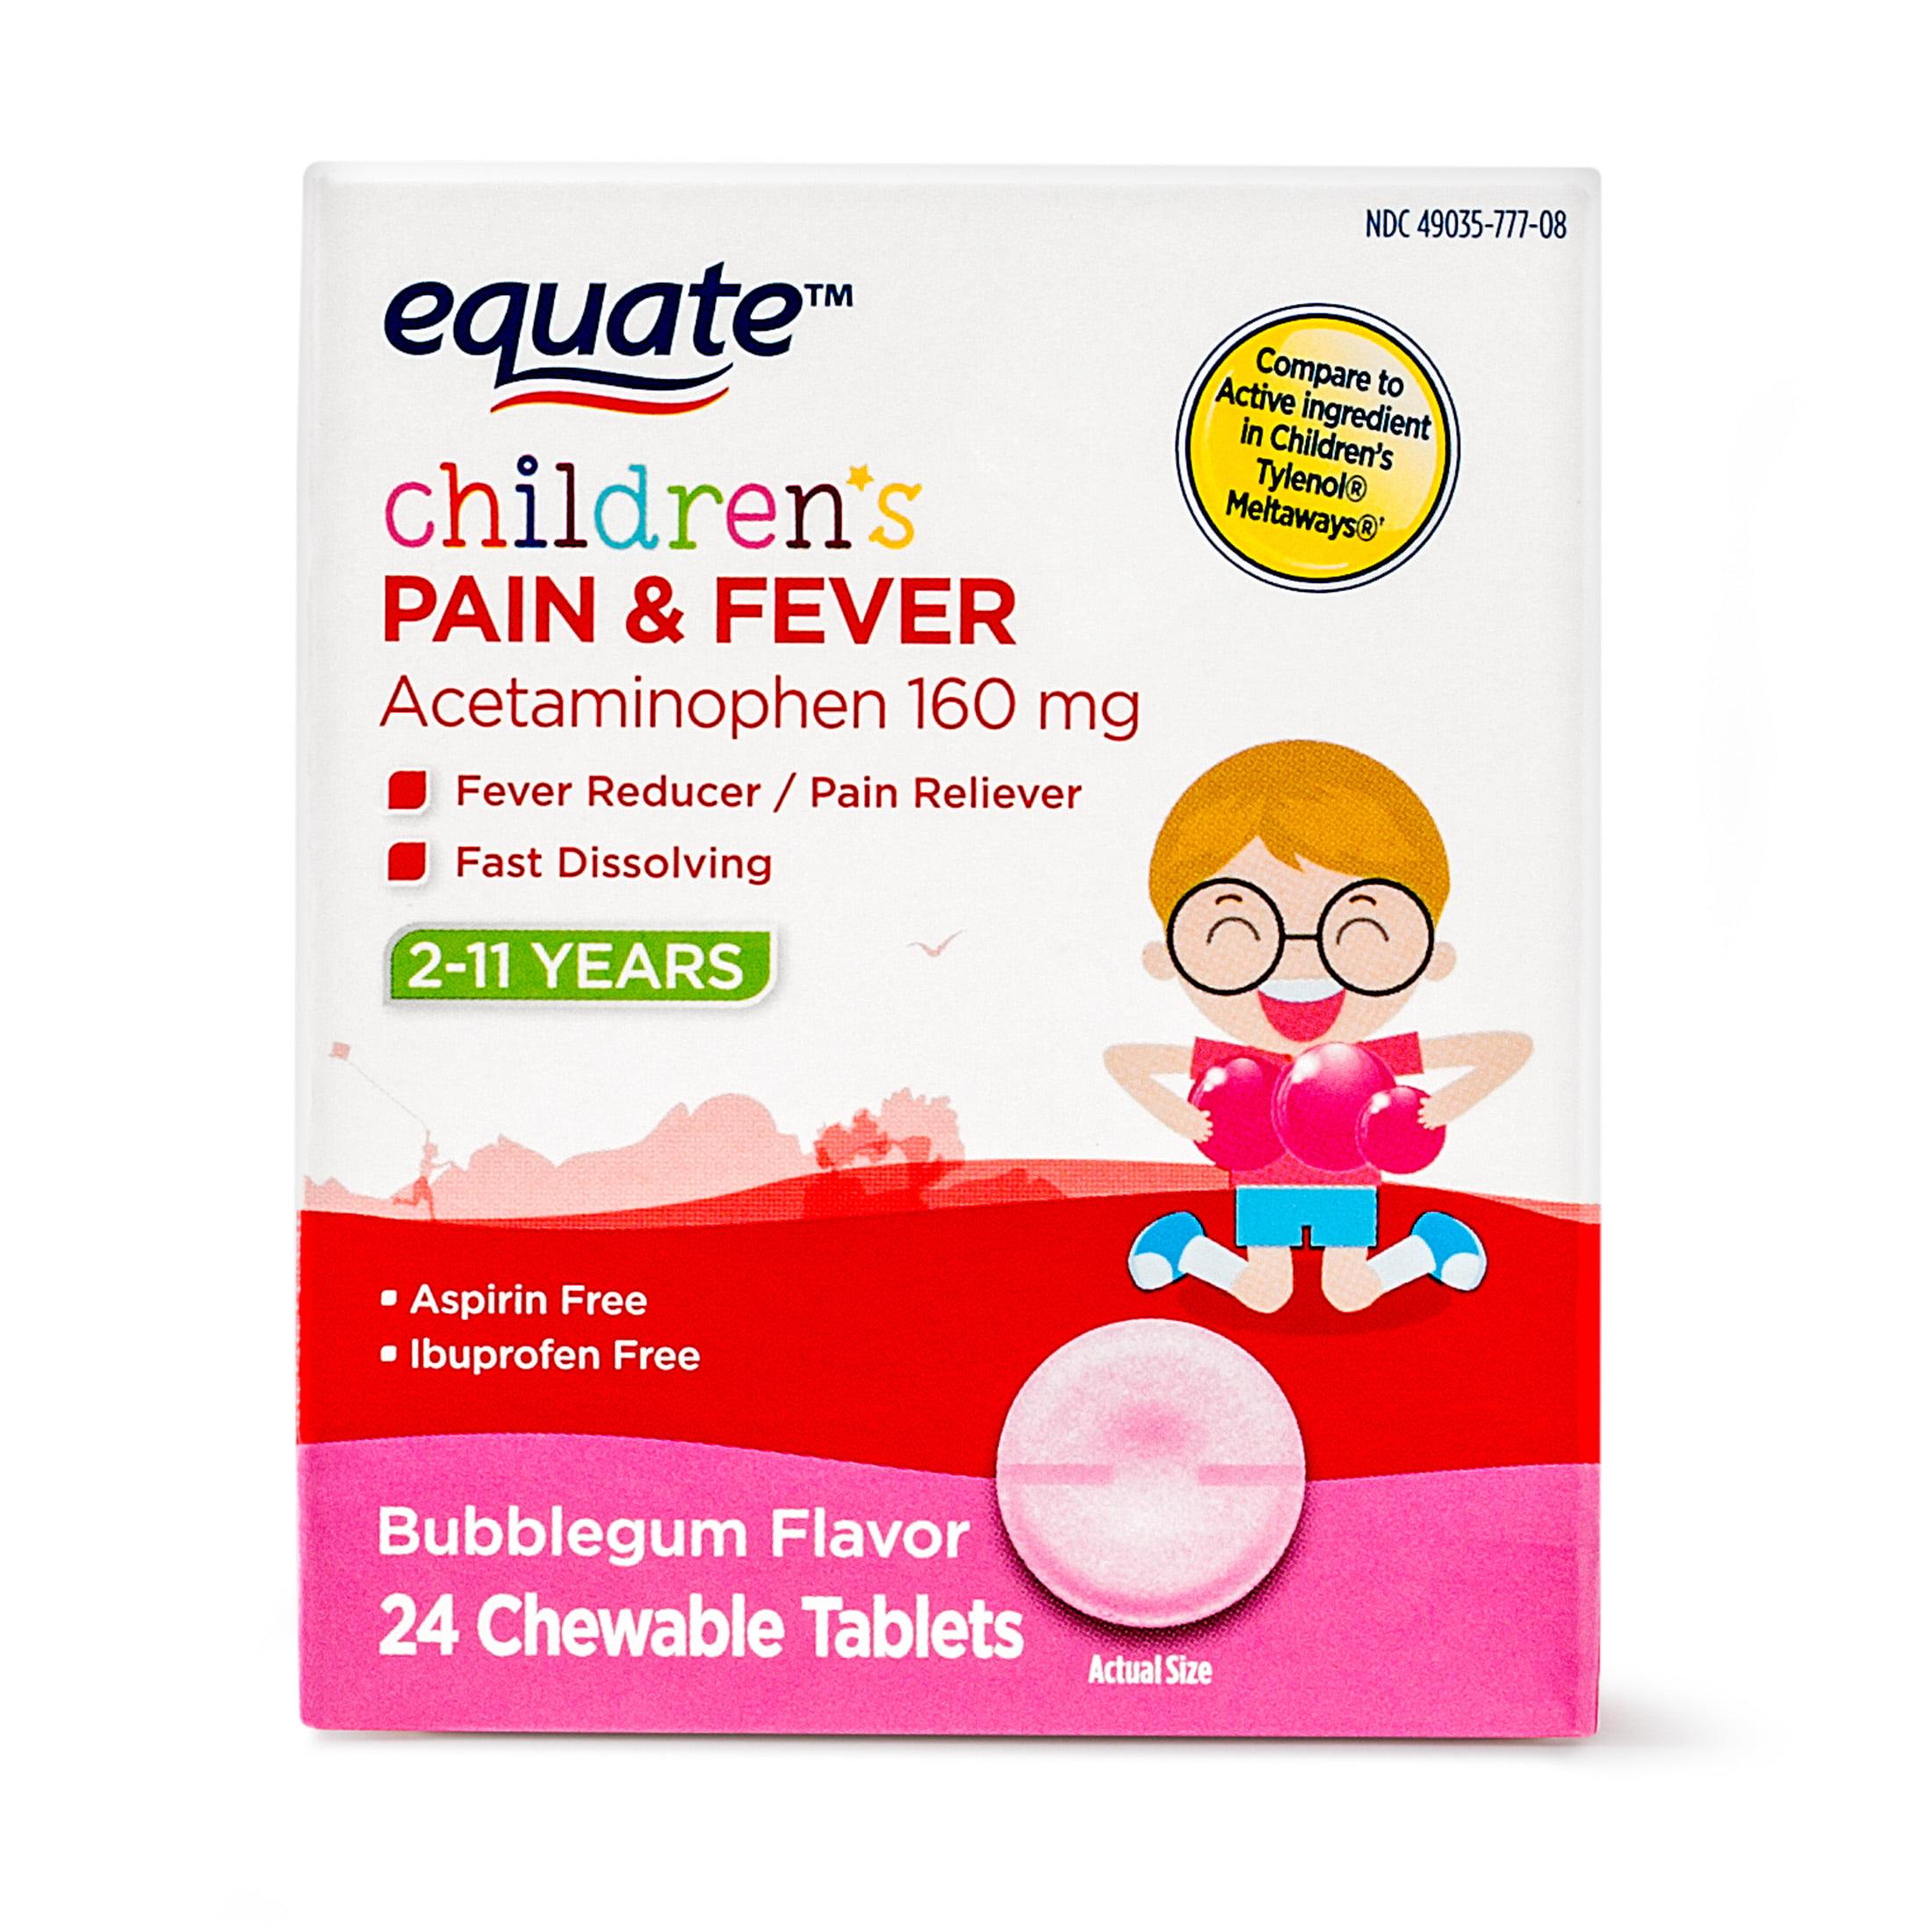 Equate Children's Acetaminophen Chewable Bubblegum Tablets, 160 mg, 24 Ct